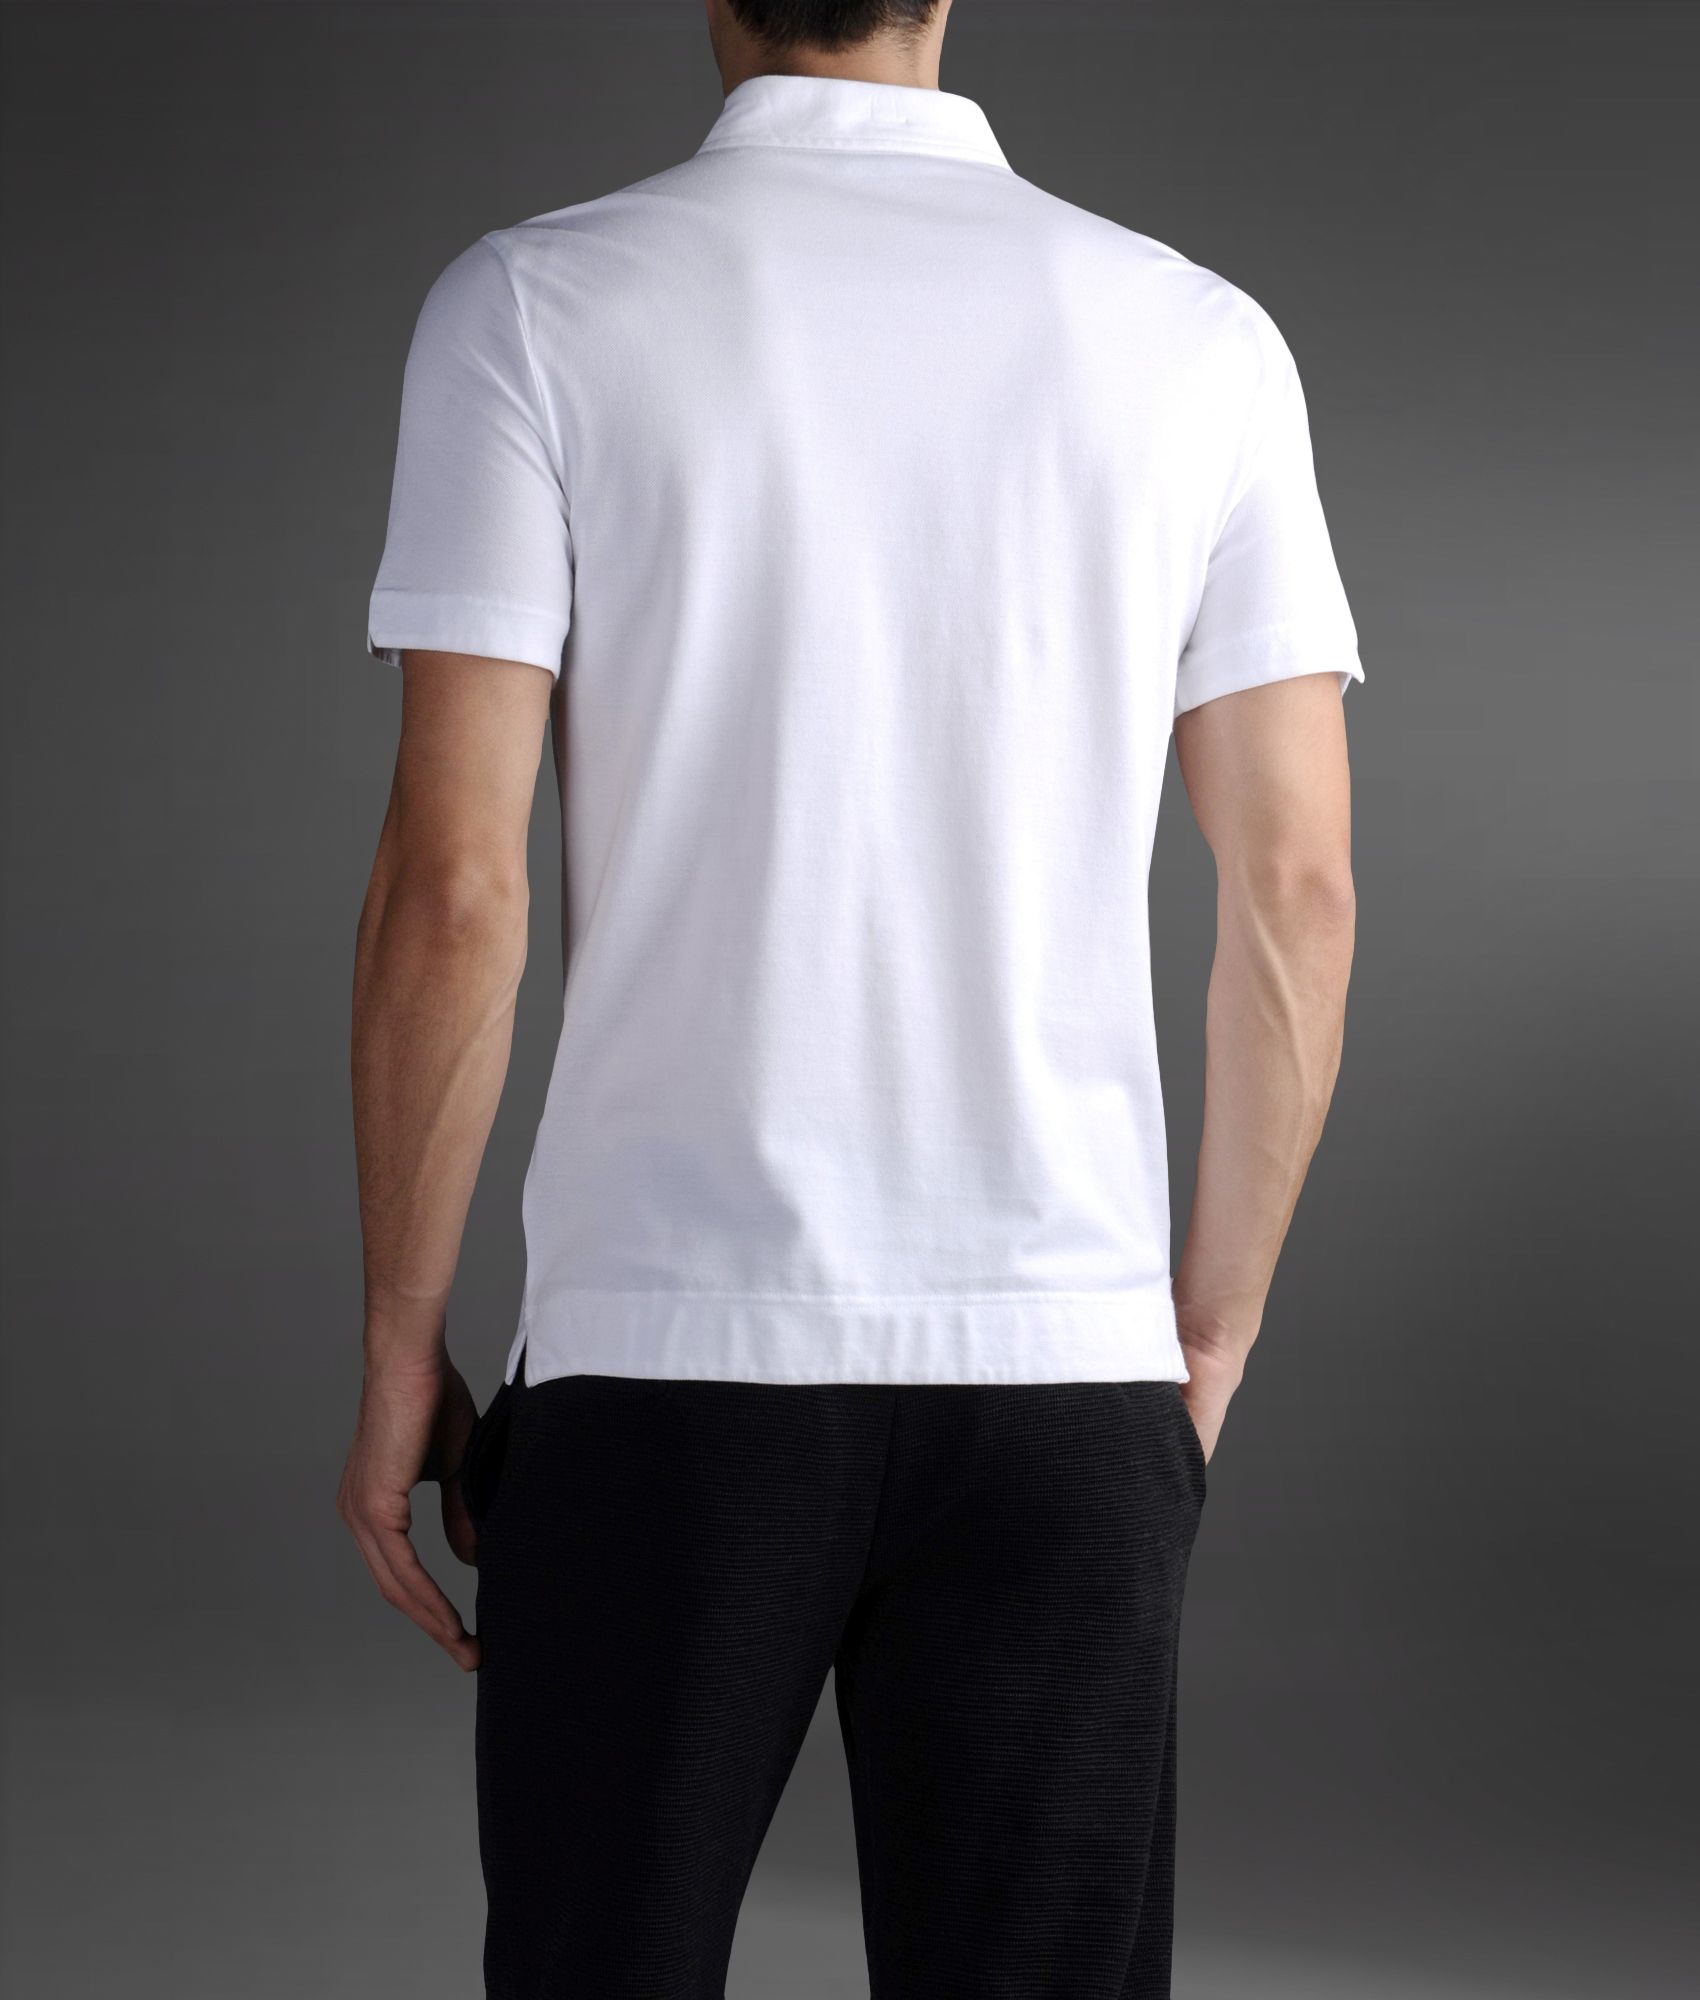 In Pique For With Armani Pocket Shirt Polo Cotton Emporio White xqawtRT7RX